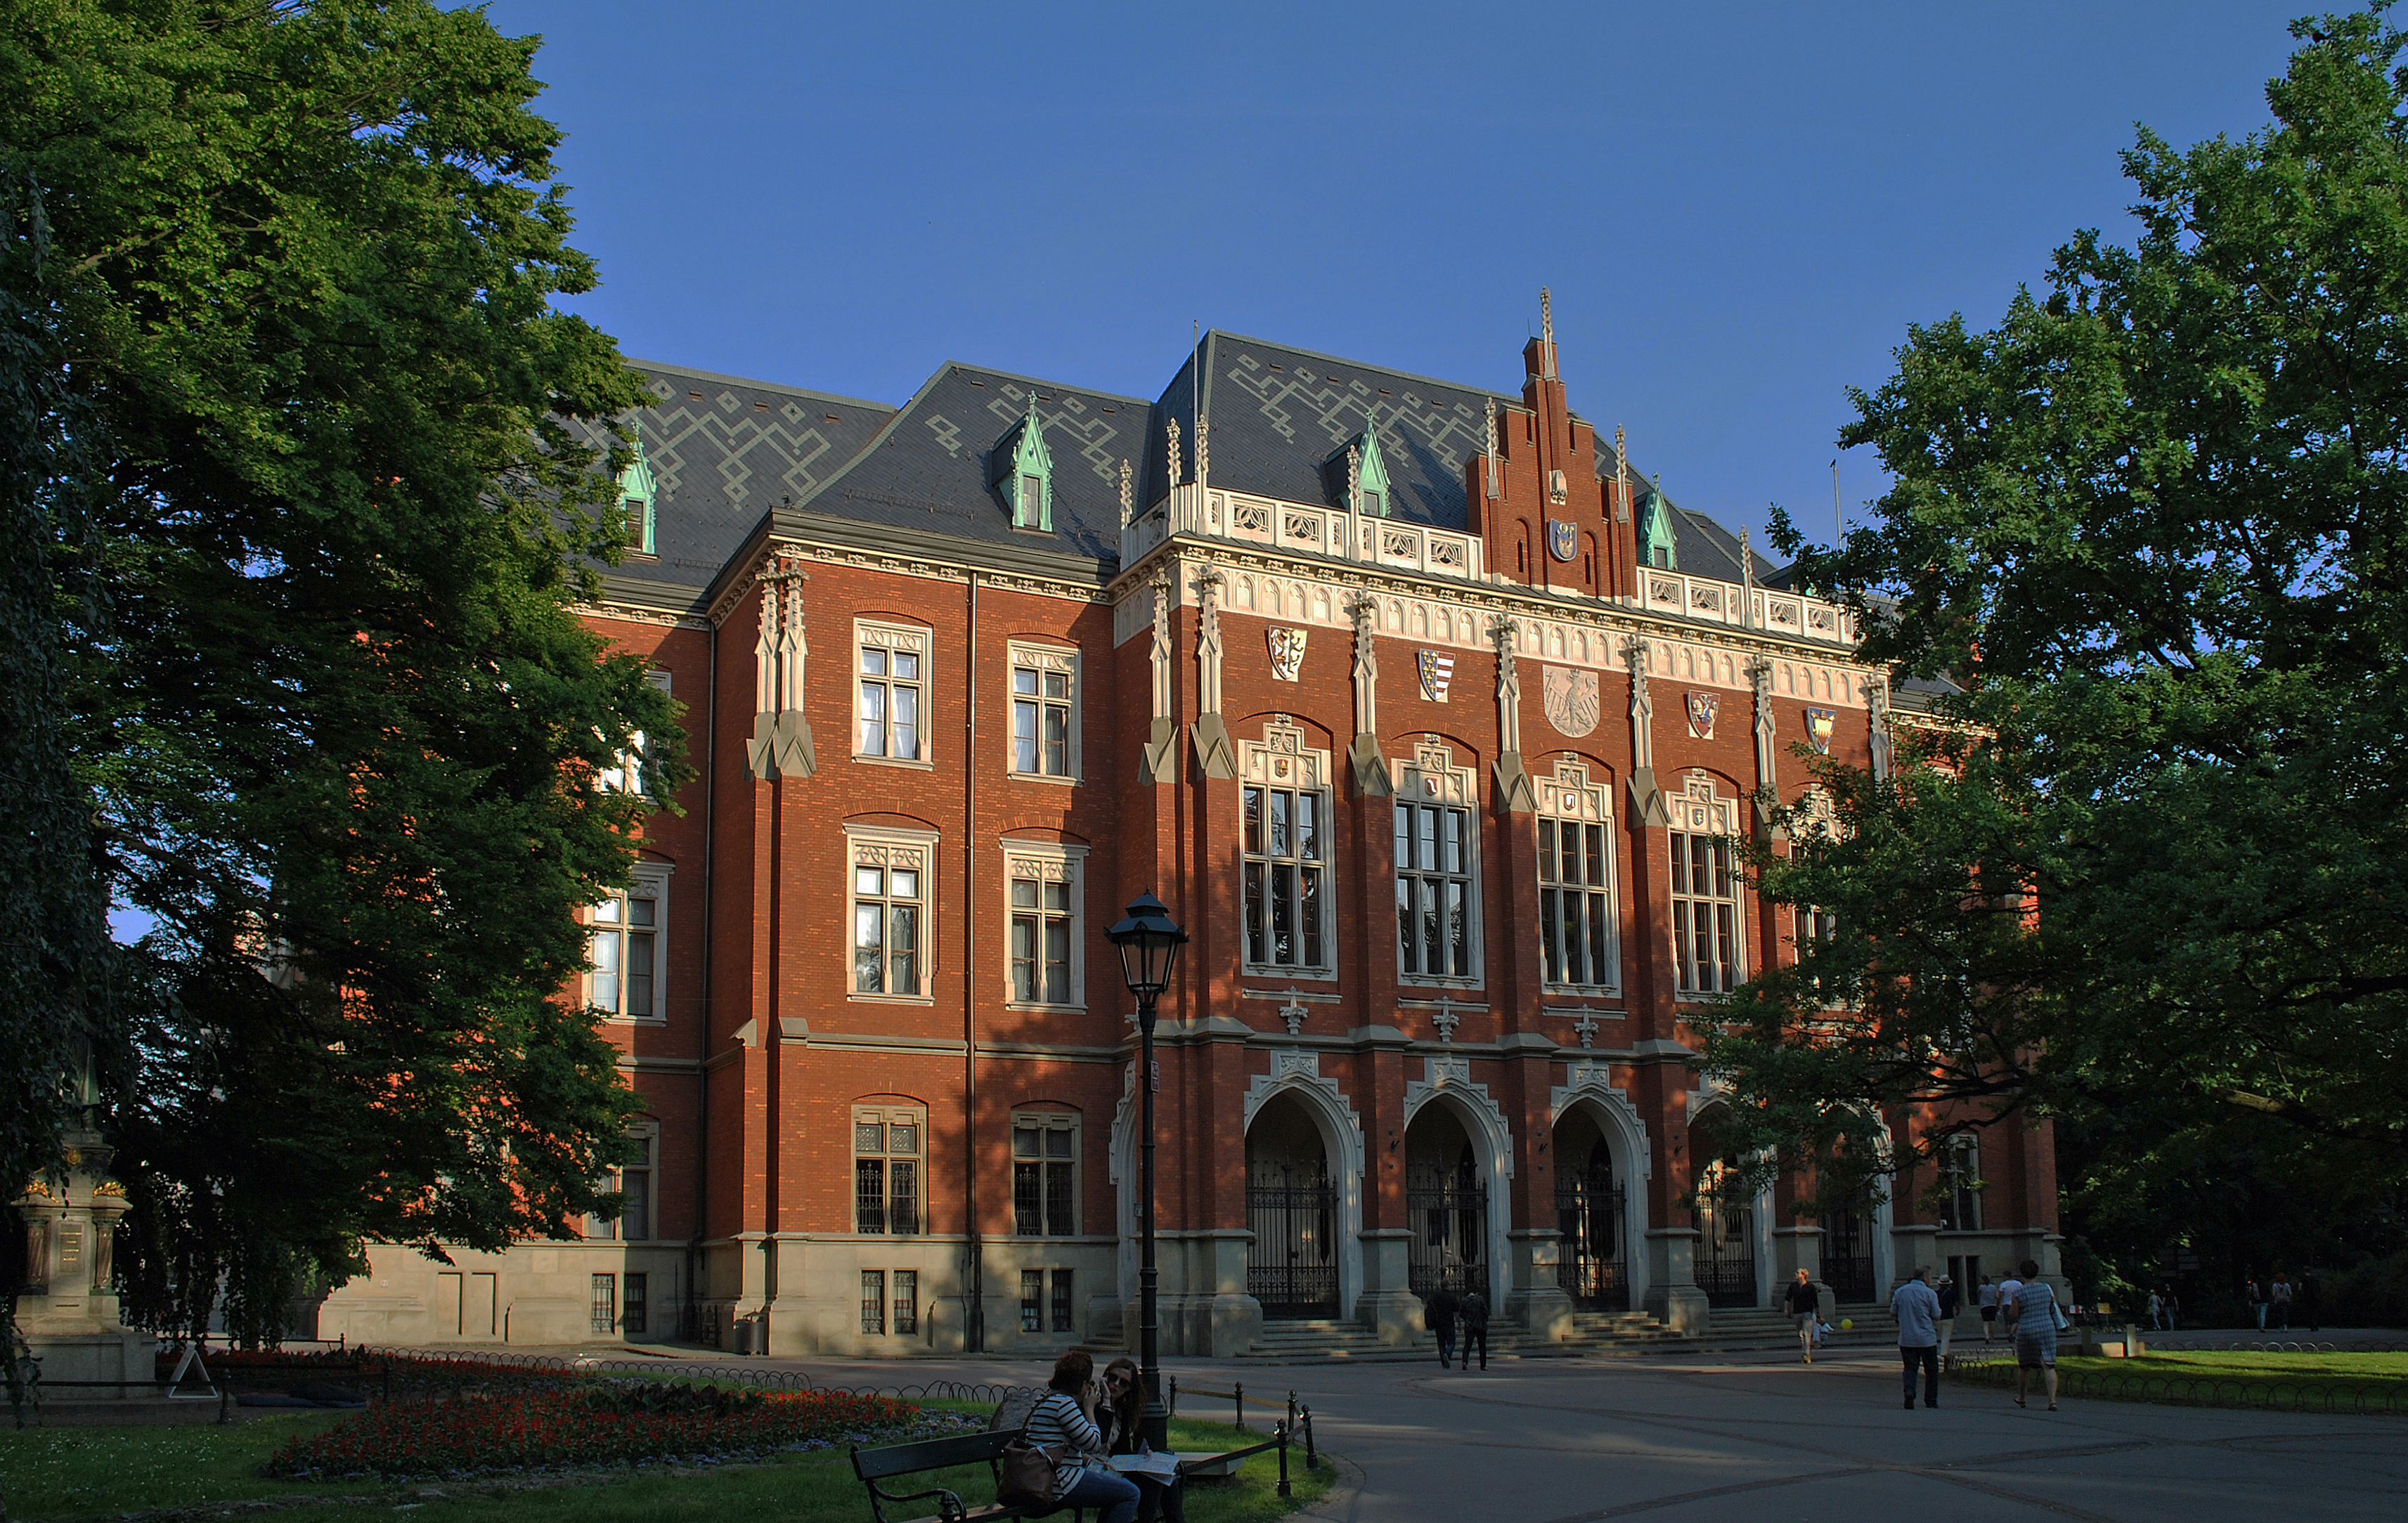 Jagiellonian University Collegium Novum, 1882 designed by Feliks Księżarski, 24 Gołębia street, Old Town, Krakow, Poland (1)